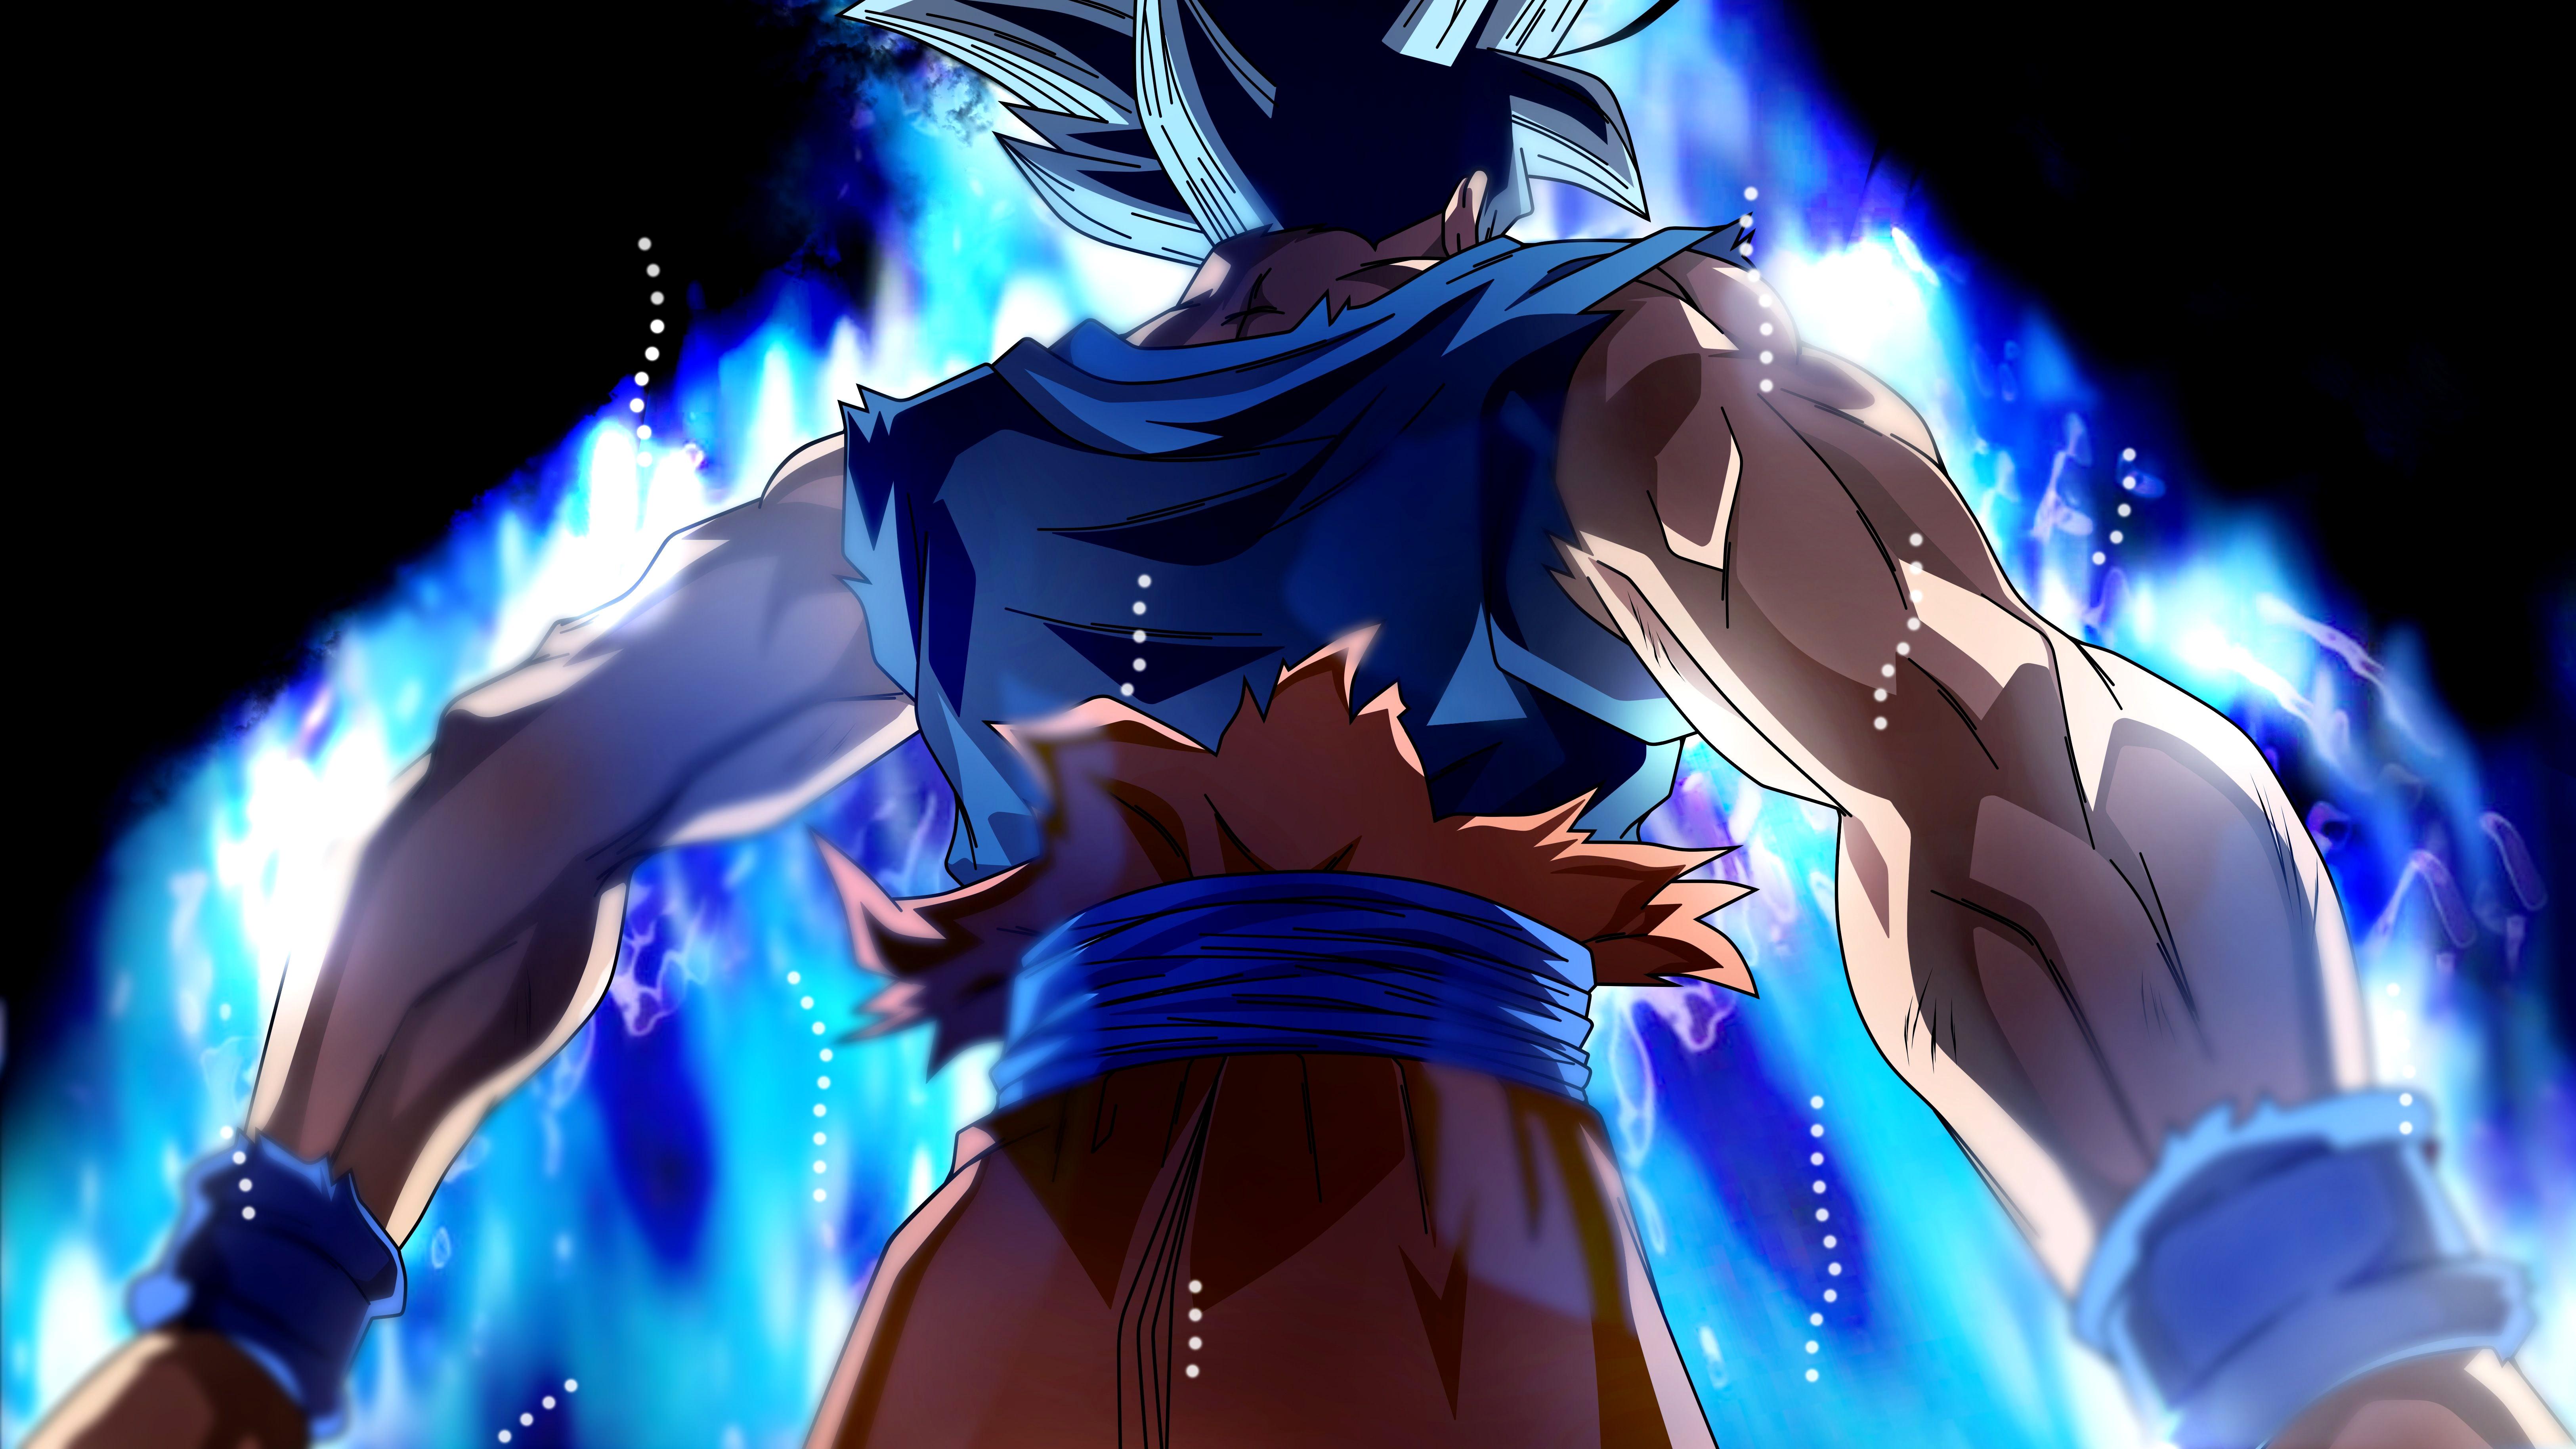 5k Anime Wallpapers Top Free 5k Anime Backgrounds Goku - Dragon Ball Super - HD Wallpaper